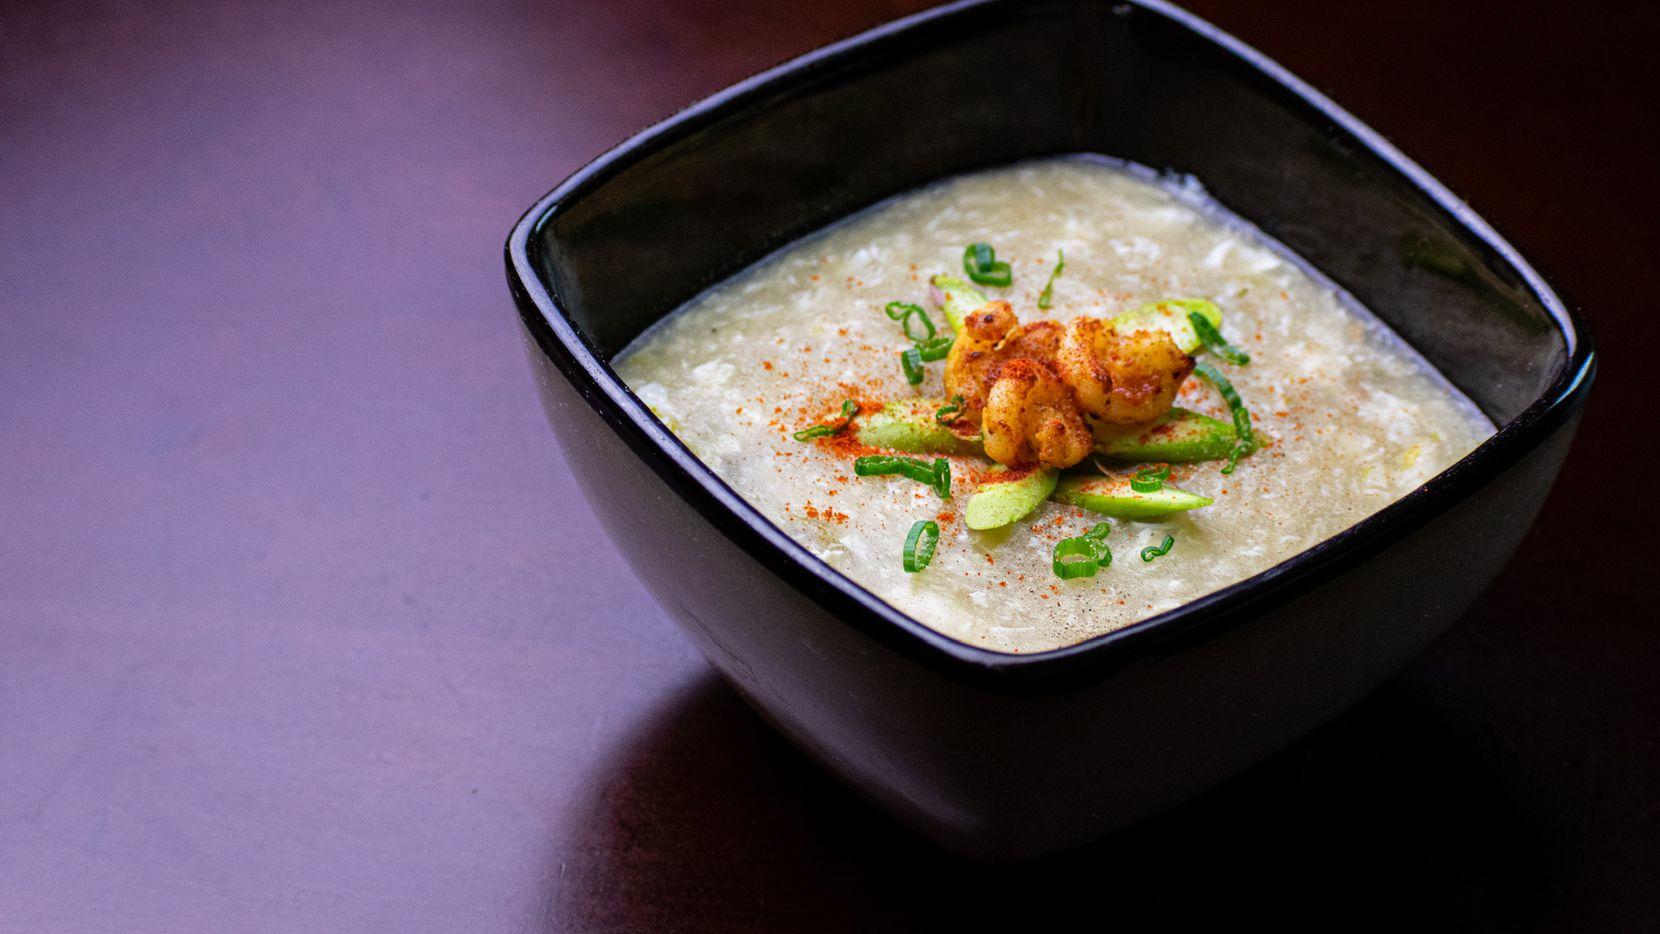 Shrimp Asparagus Soup at Krio by Connie Cheng